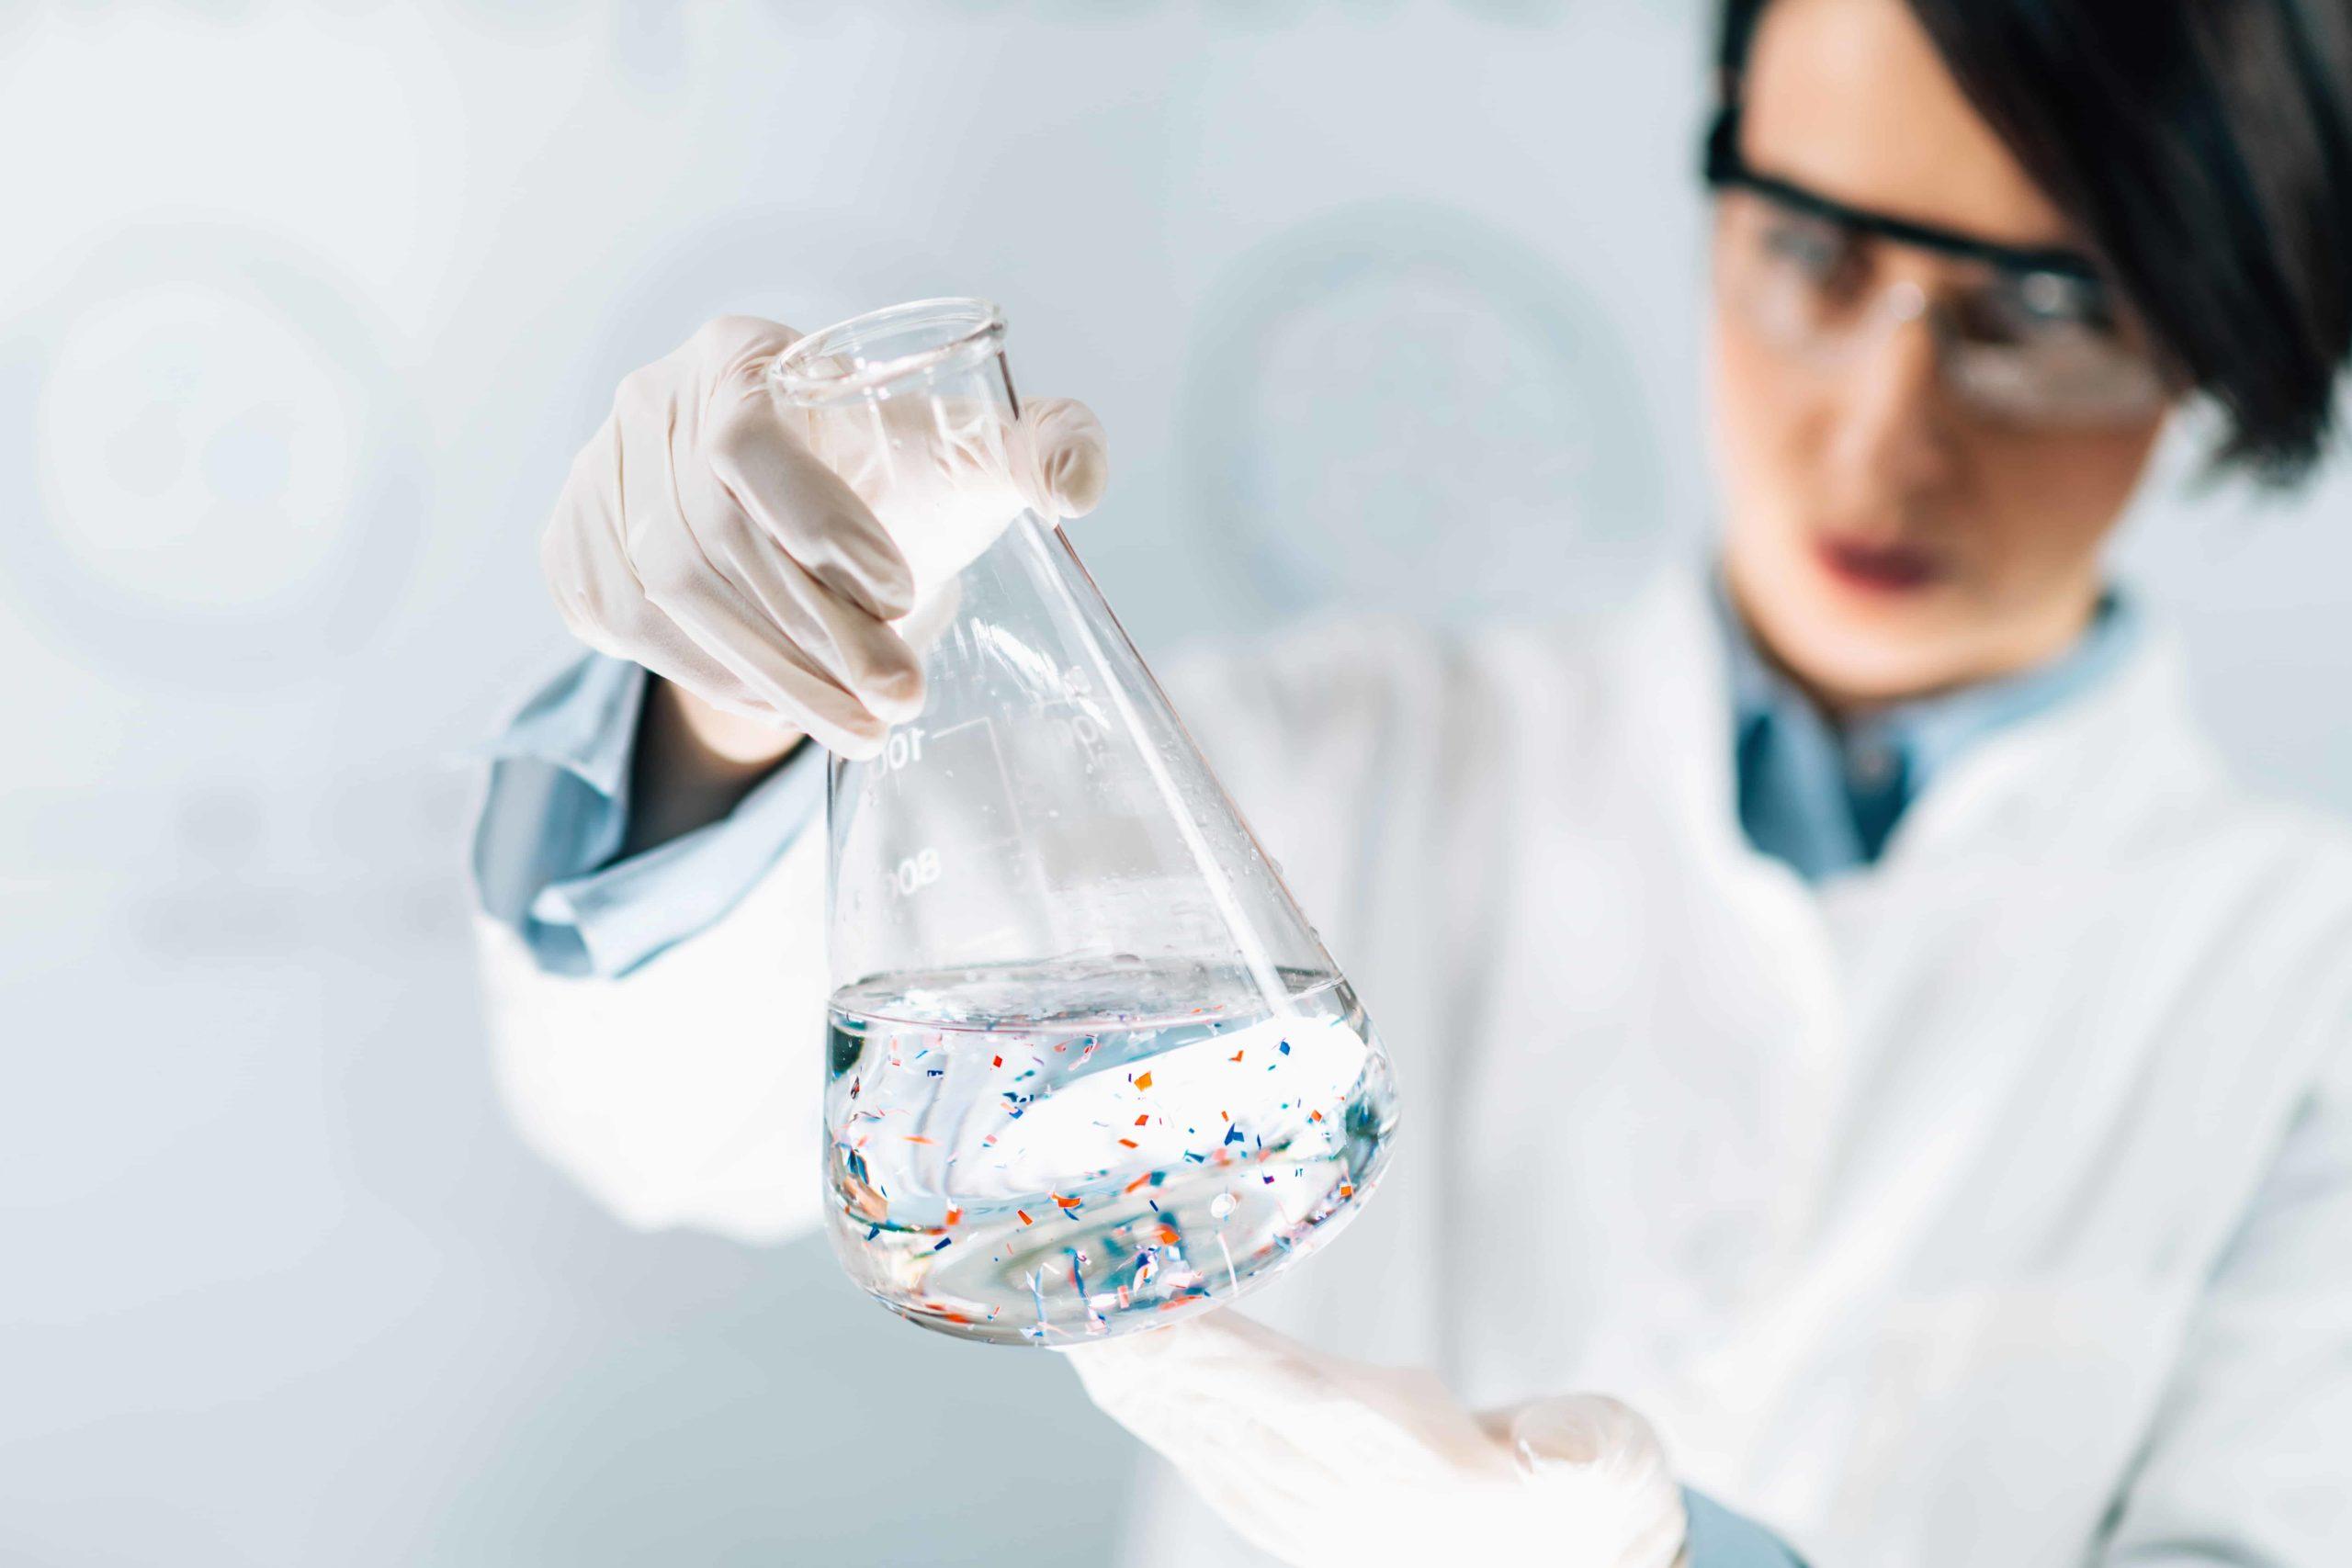 microplastics in drinking water